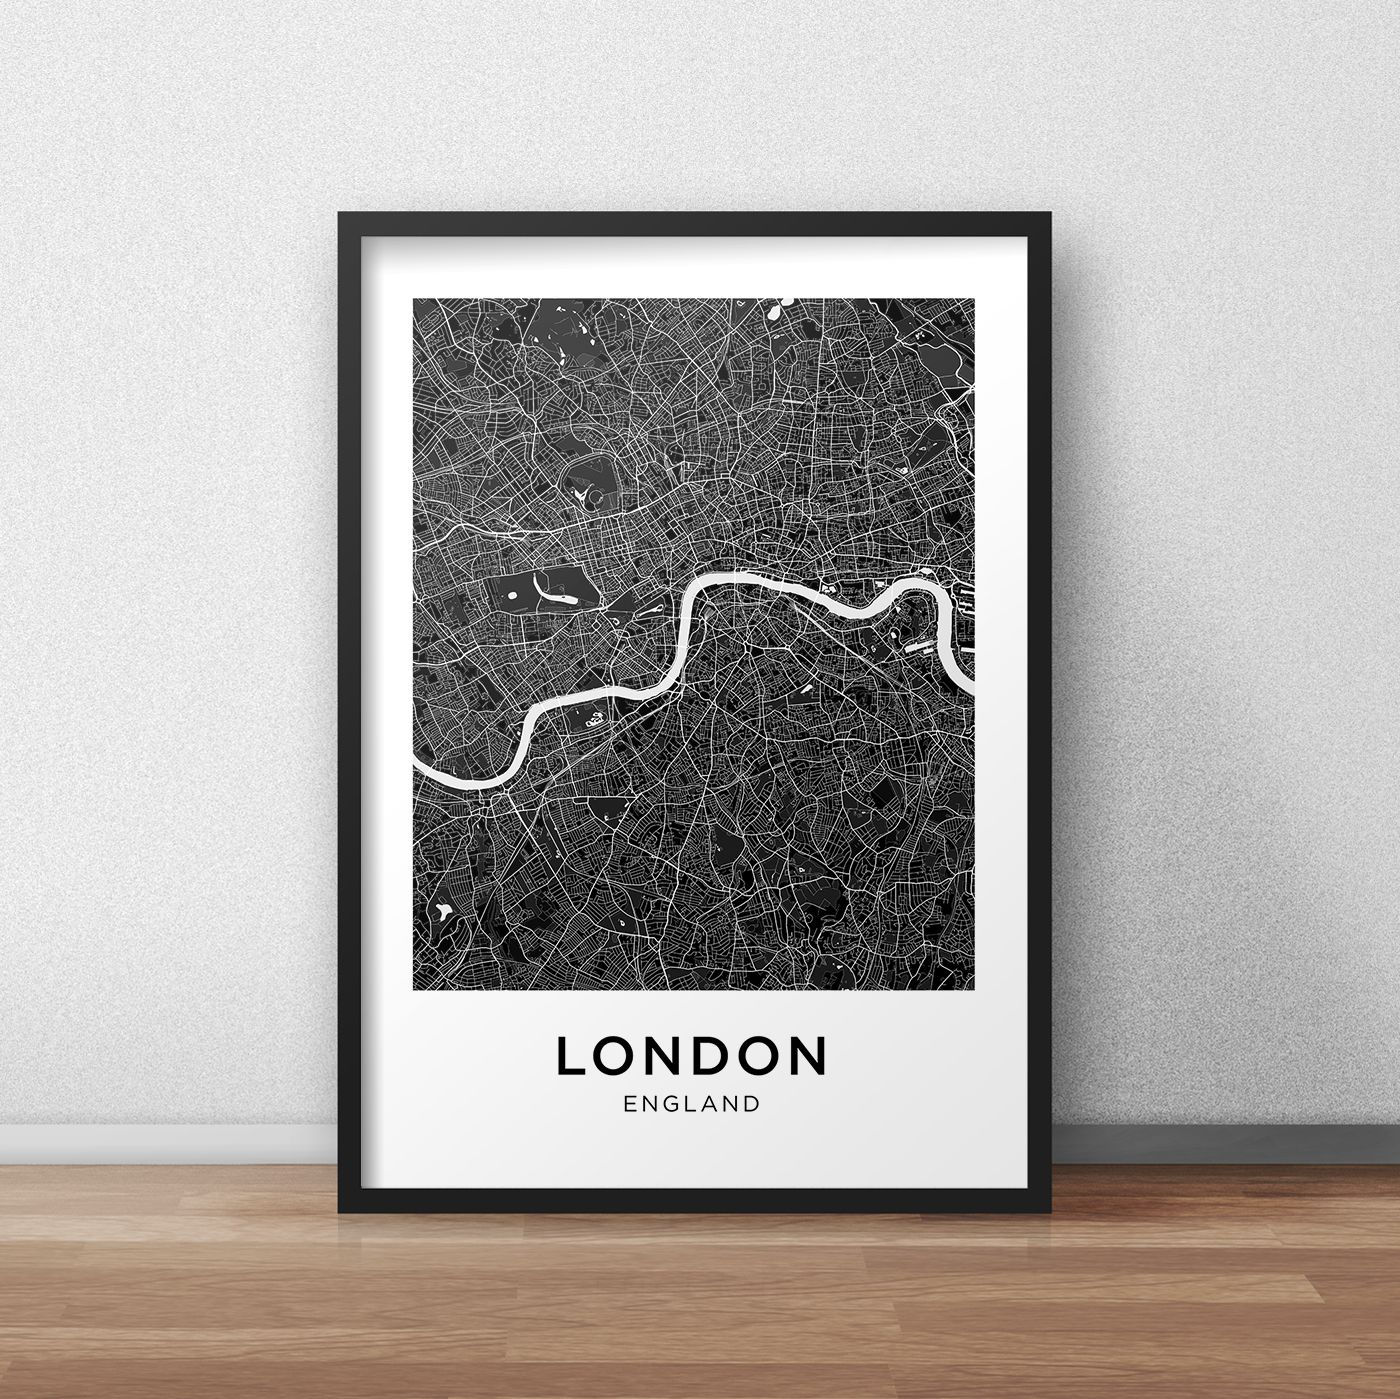 London City Map Printable.London Map Print London Map Download City Map London London